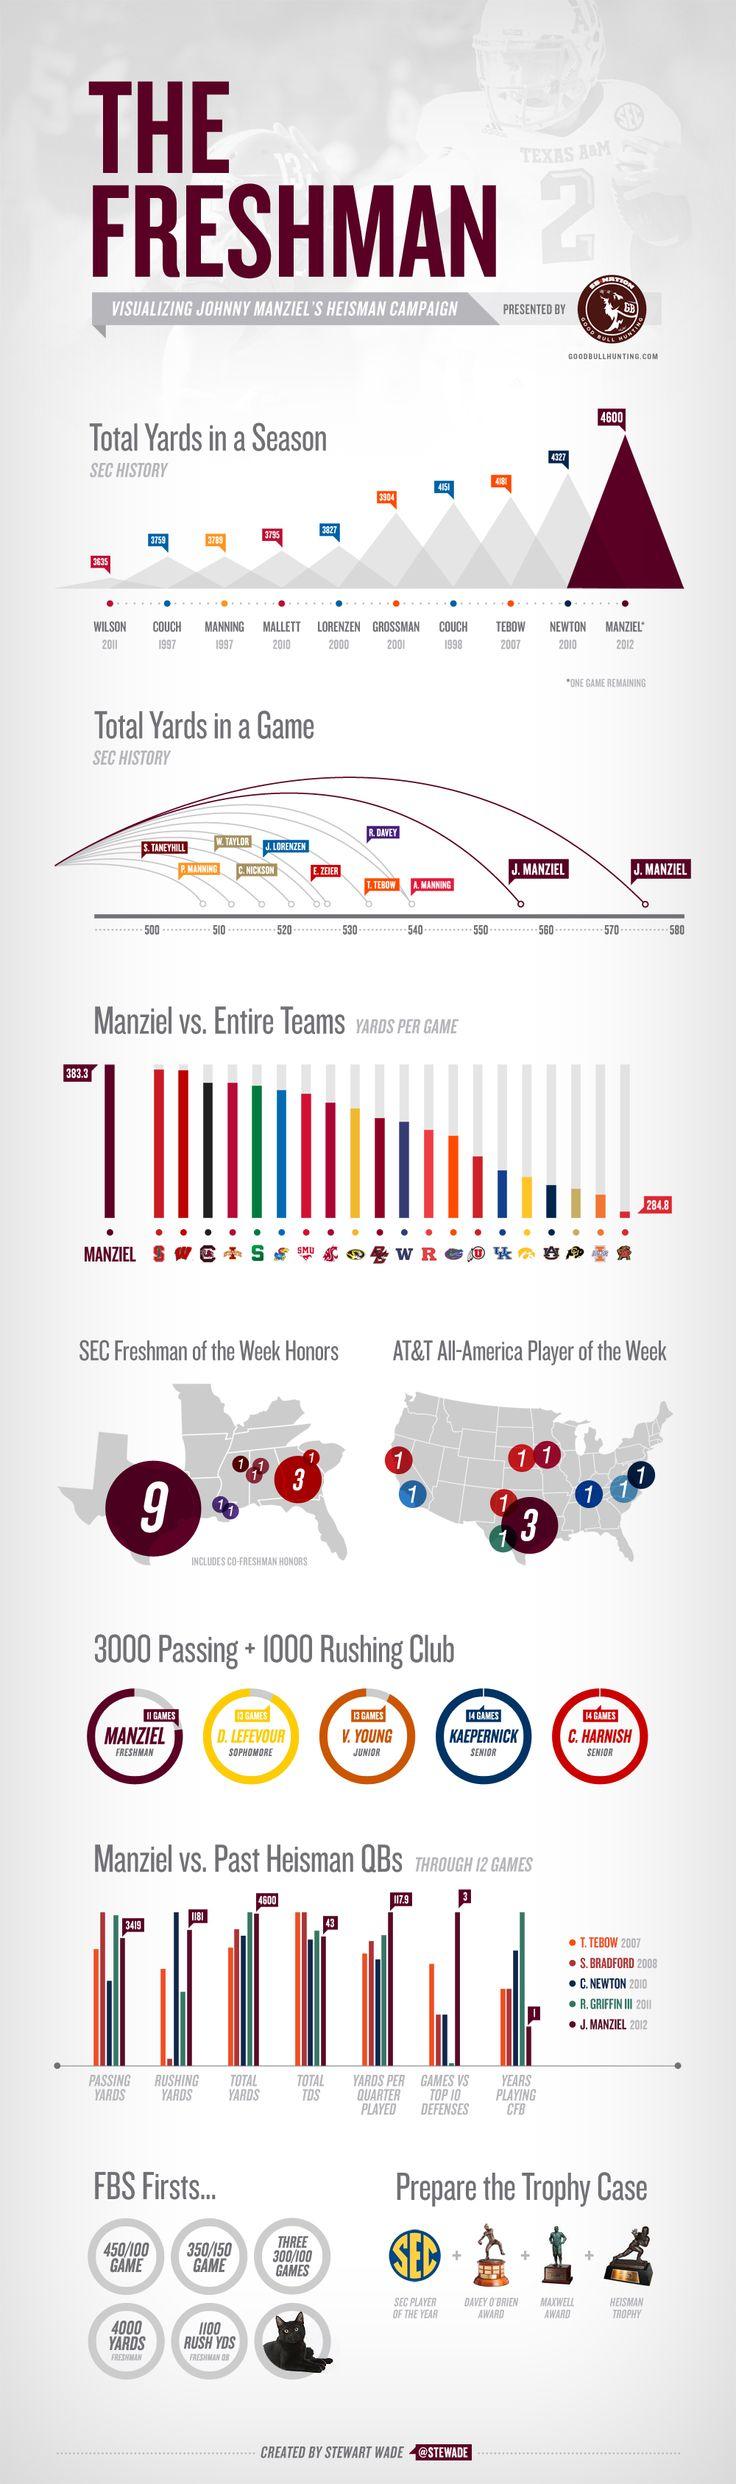 THE FRESHMAN: Visualizing Johnny Manziel's 2012 Heisman Campaign #JohnnyFootball